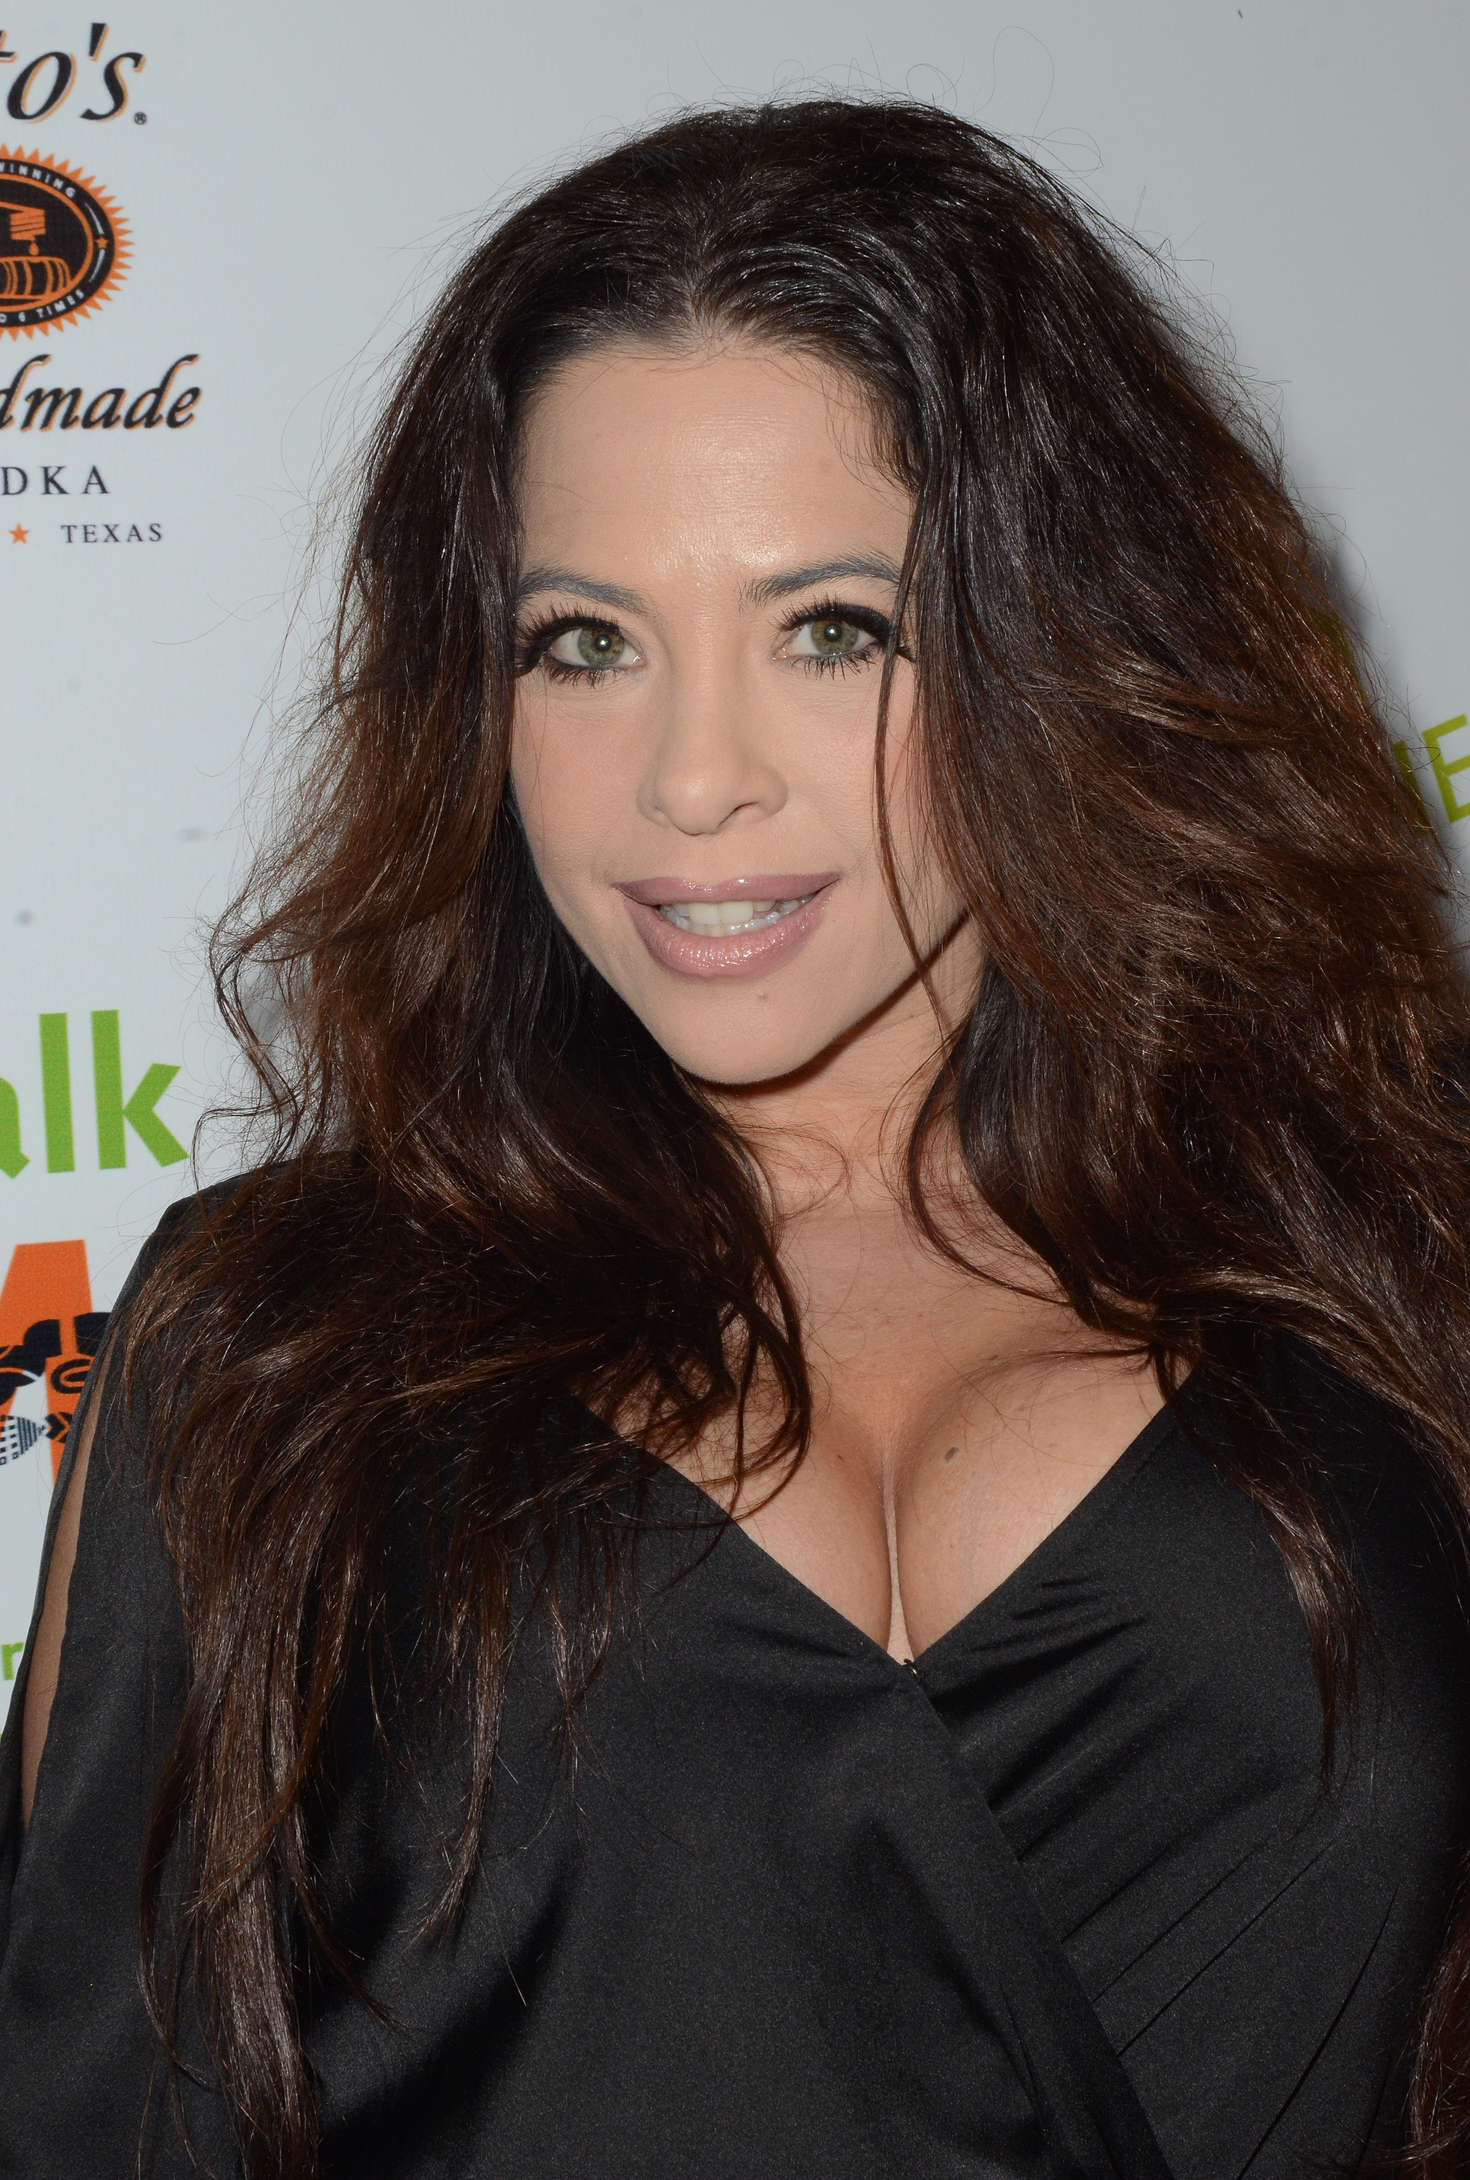 Brooke Lewis - 3rd Annual LA's Walk MS Celebrity Kickoff in Los Angeles